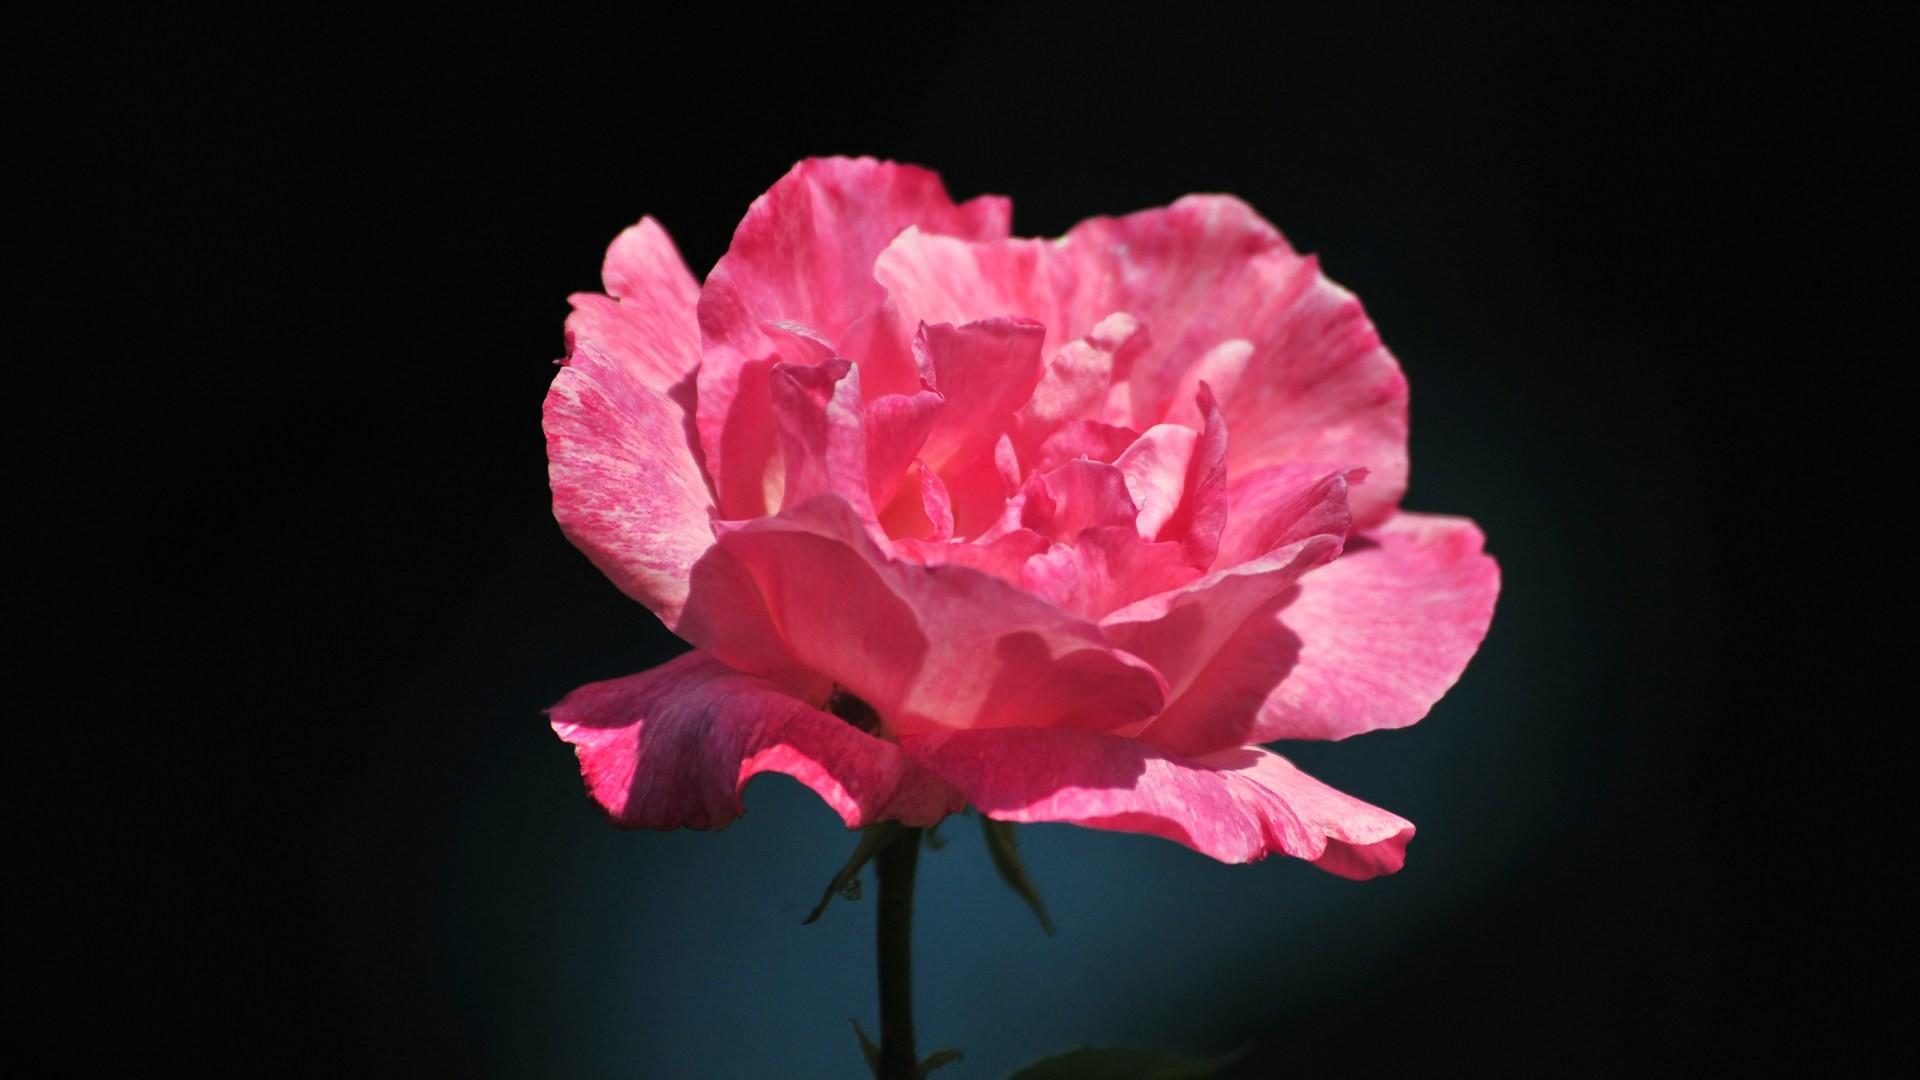 Pink rose flower wallpaper 52 images 1920x1080 beautiful pink rose flower hd wallpaper download 2135x1422 izmirmasajfo